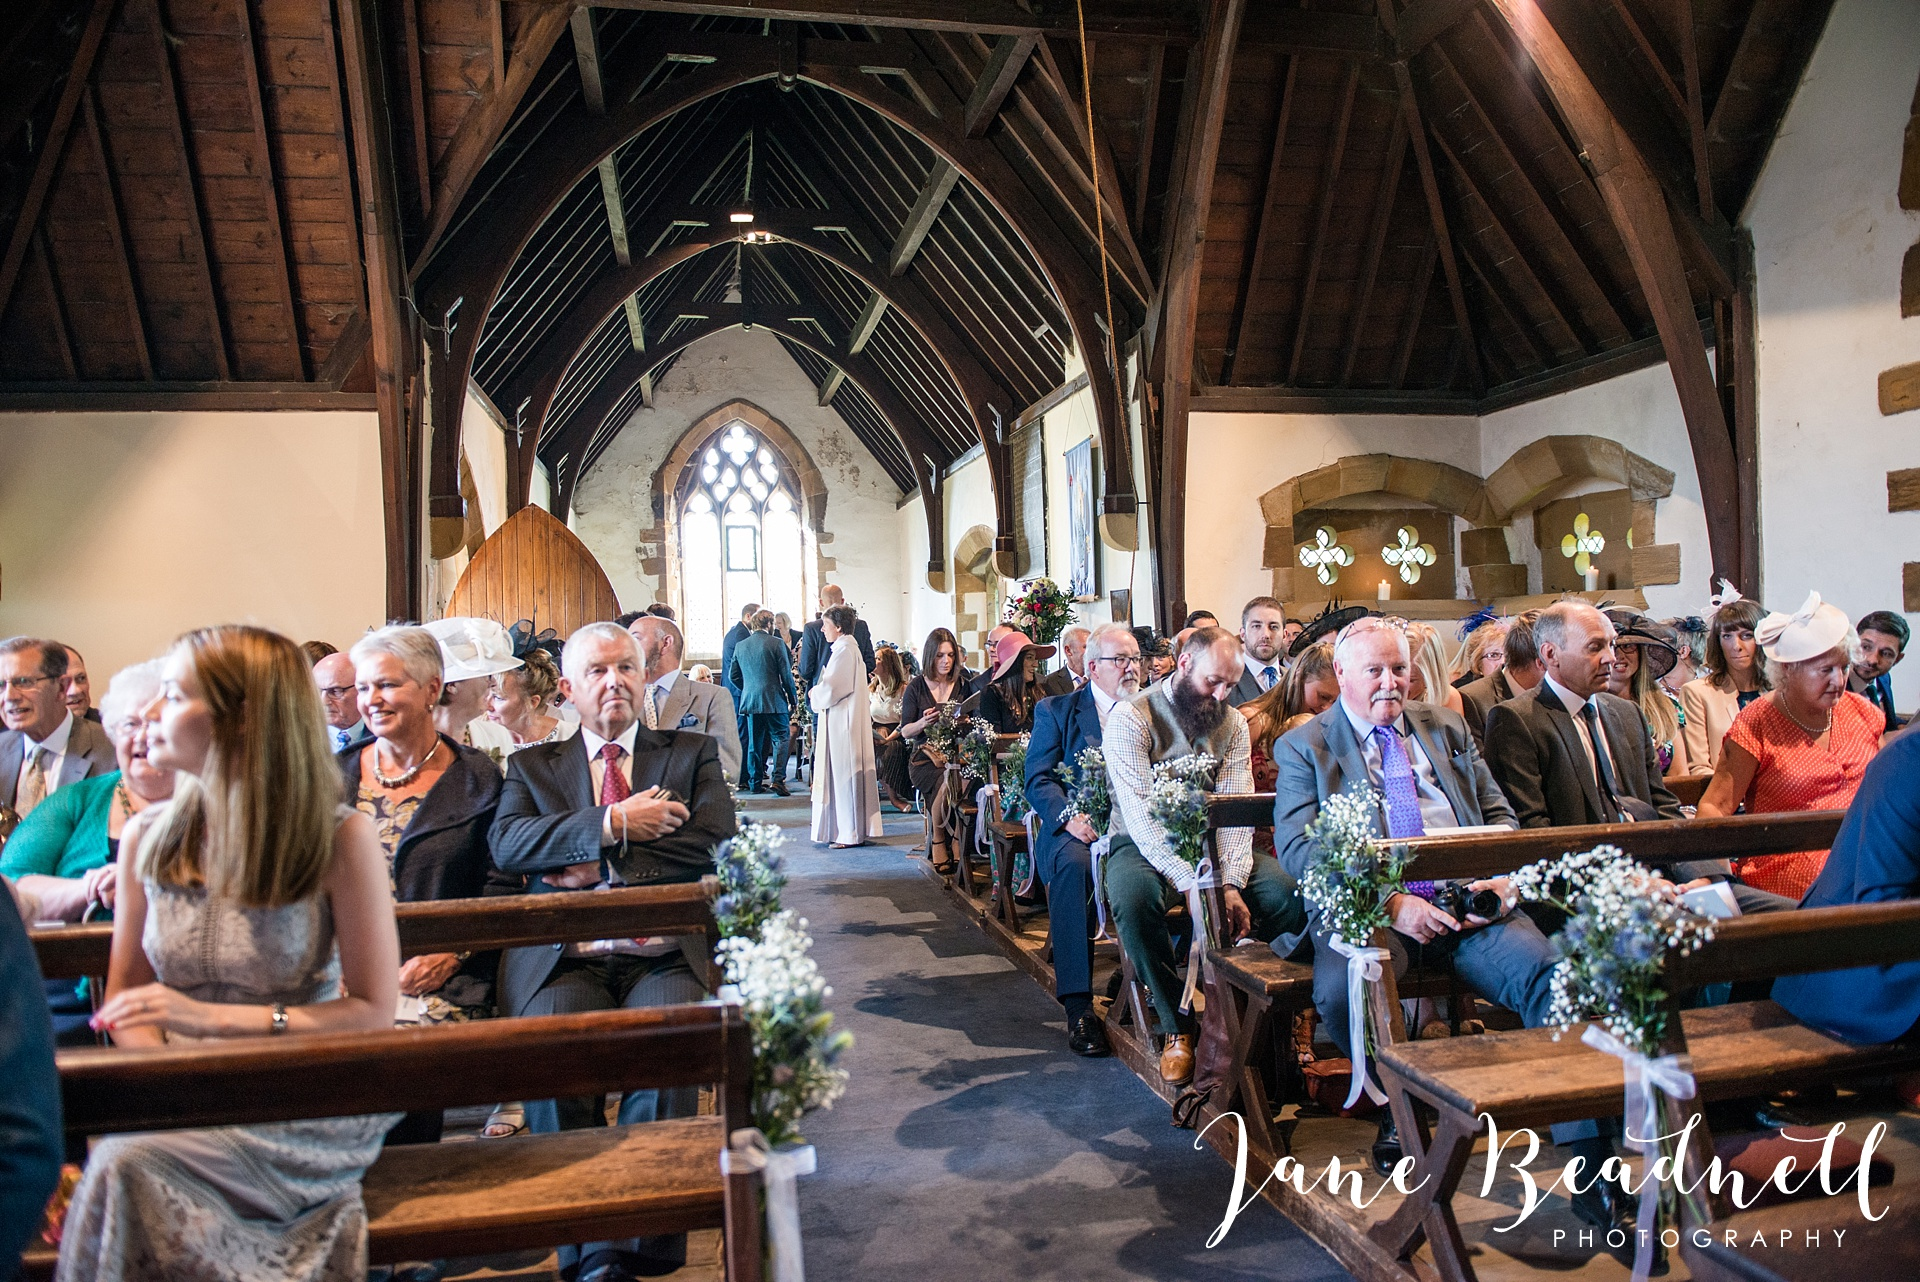 fine-art-wedding-photographer-jane-beadnell-yorkshire-wedding-photographer_0040